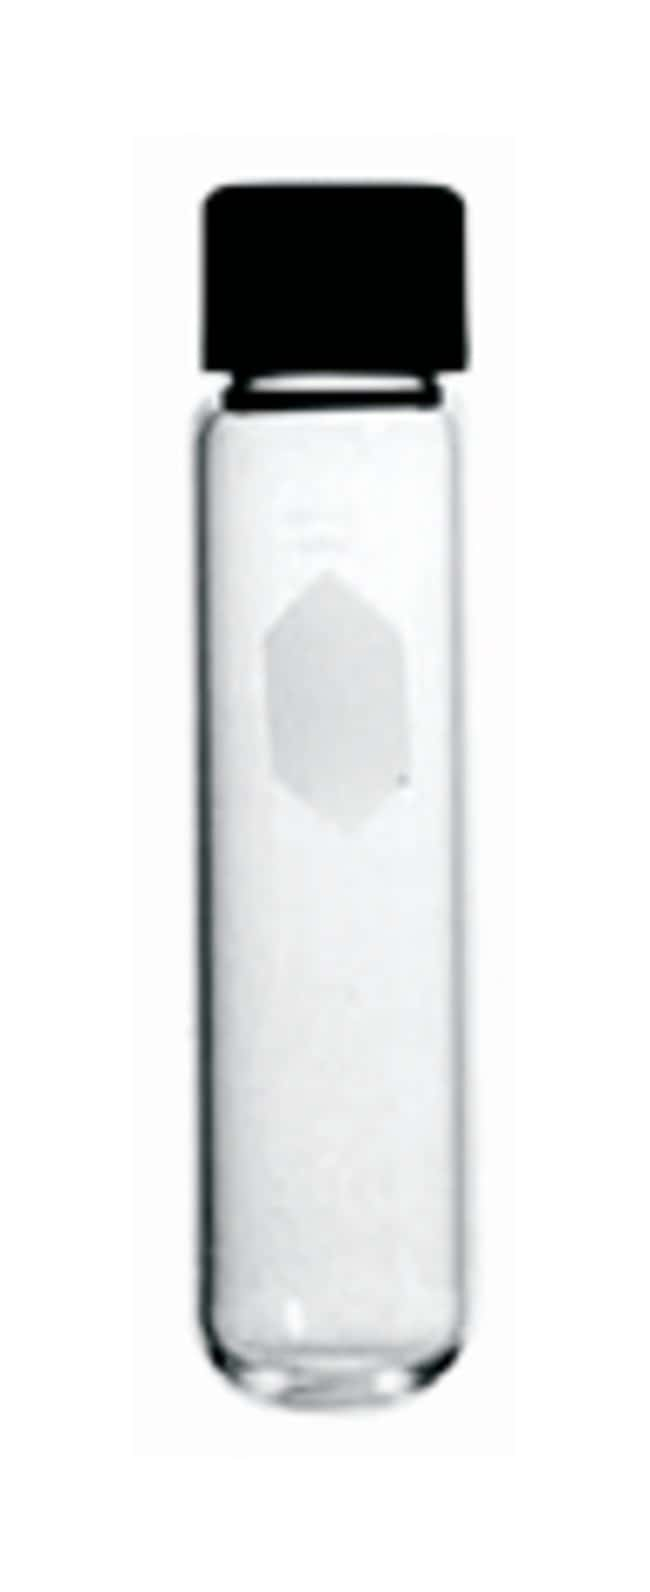 DWK Life SciencesKimble™ Kontes™ KIMAX™ Reusable Threaded Centrifuge Tubes